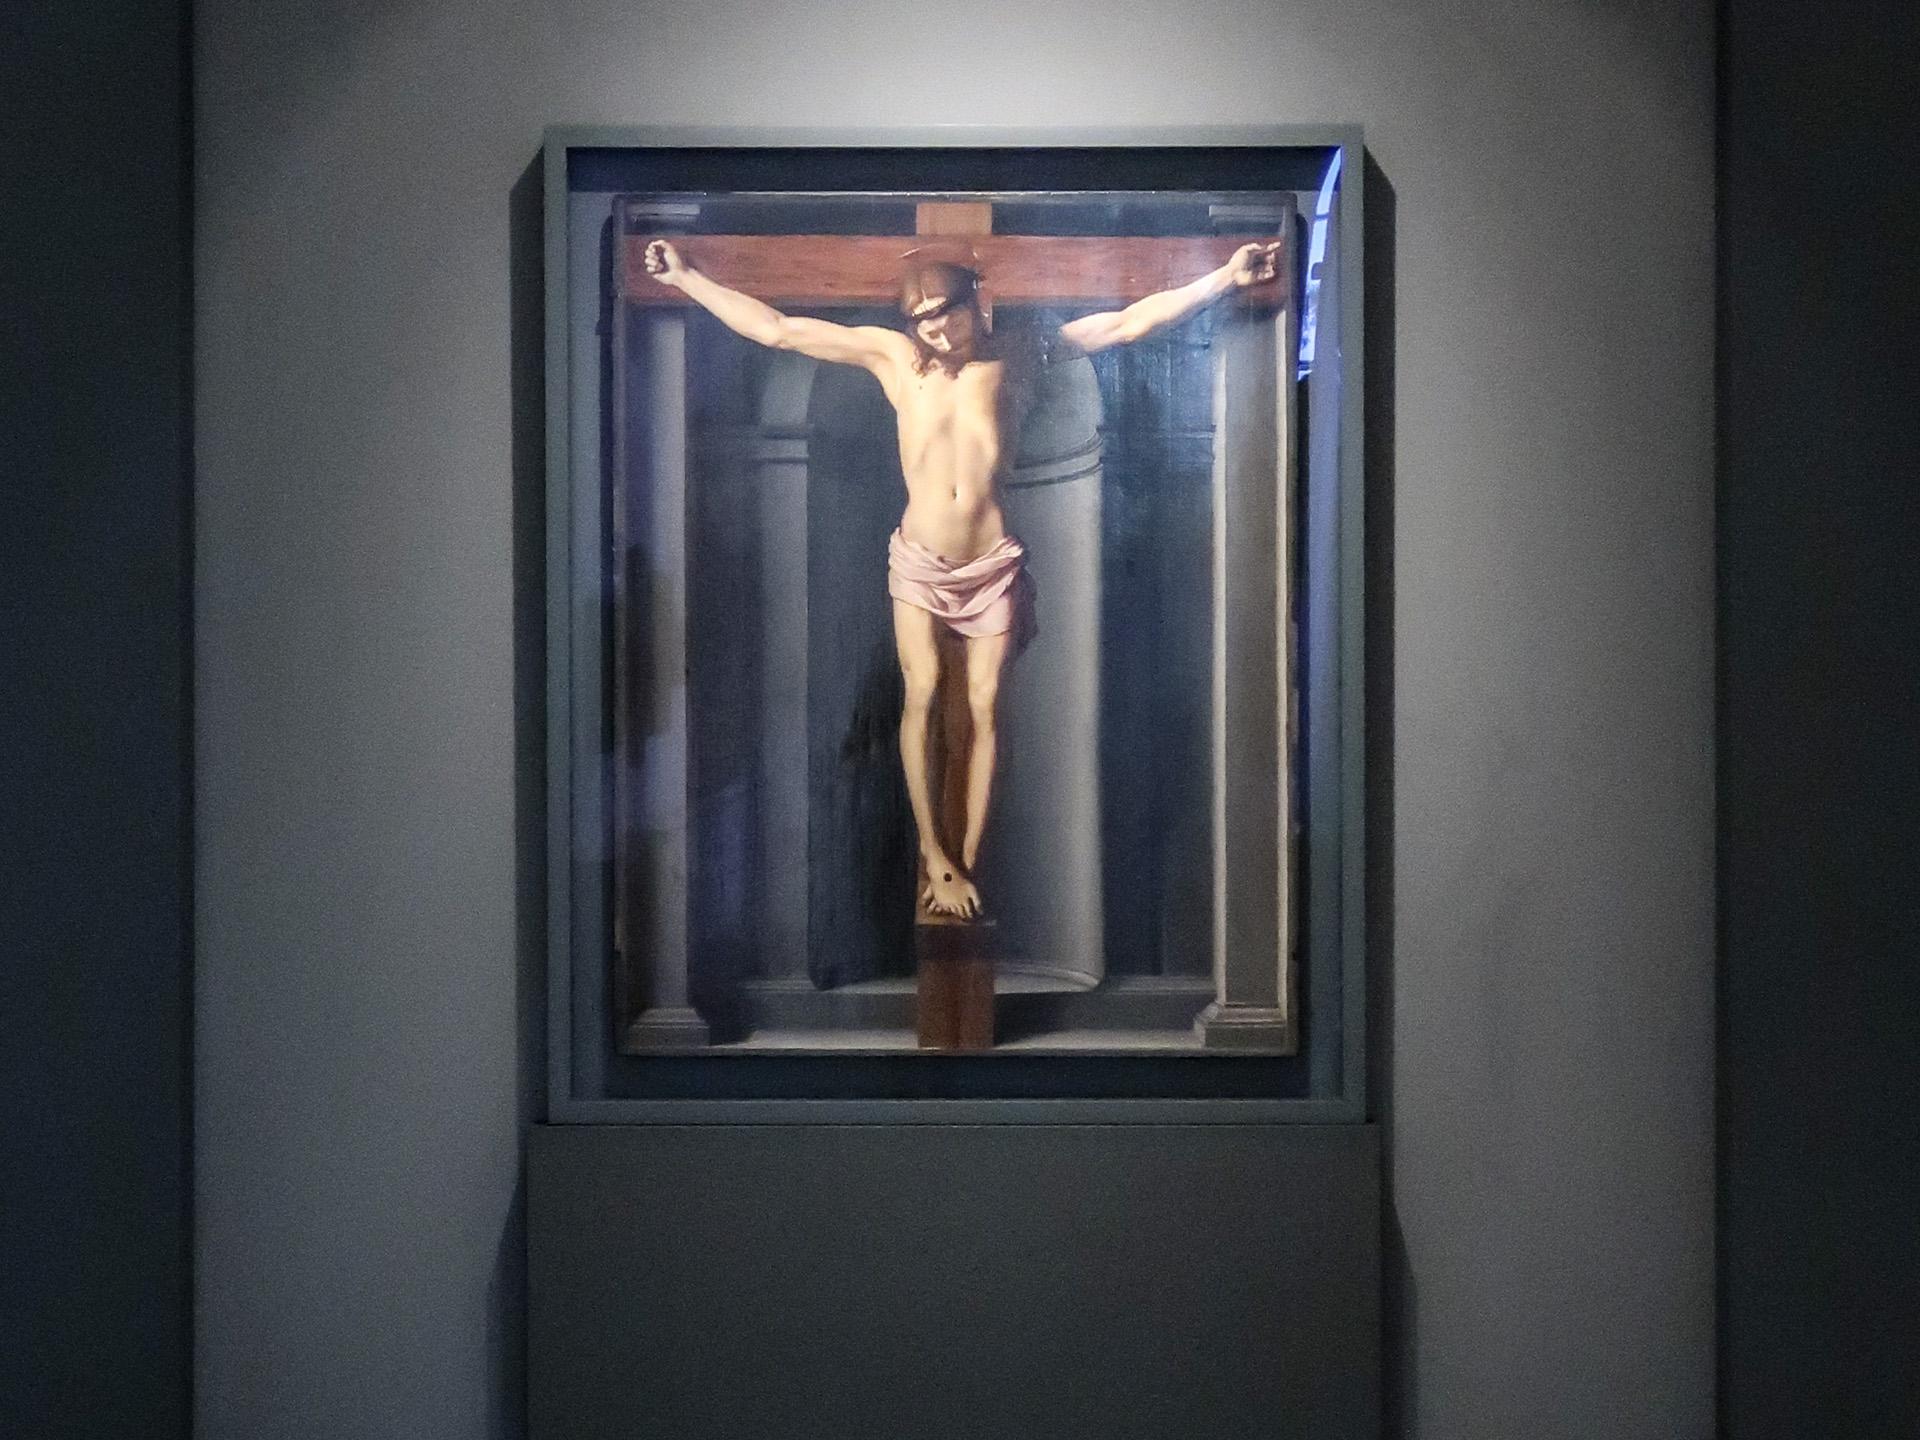 008-AtelierTournillon-Crucifixion-Bronzino